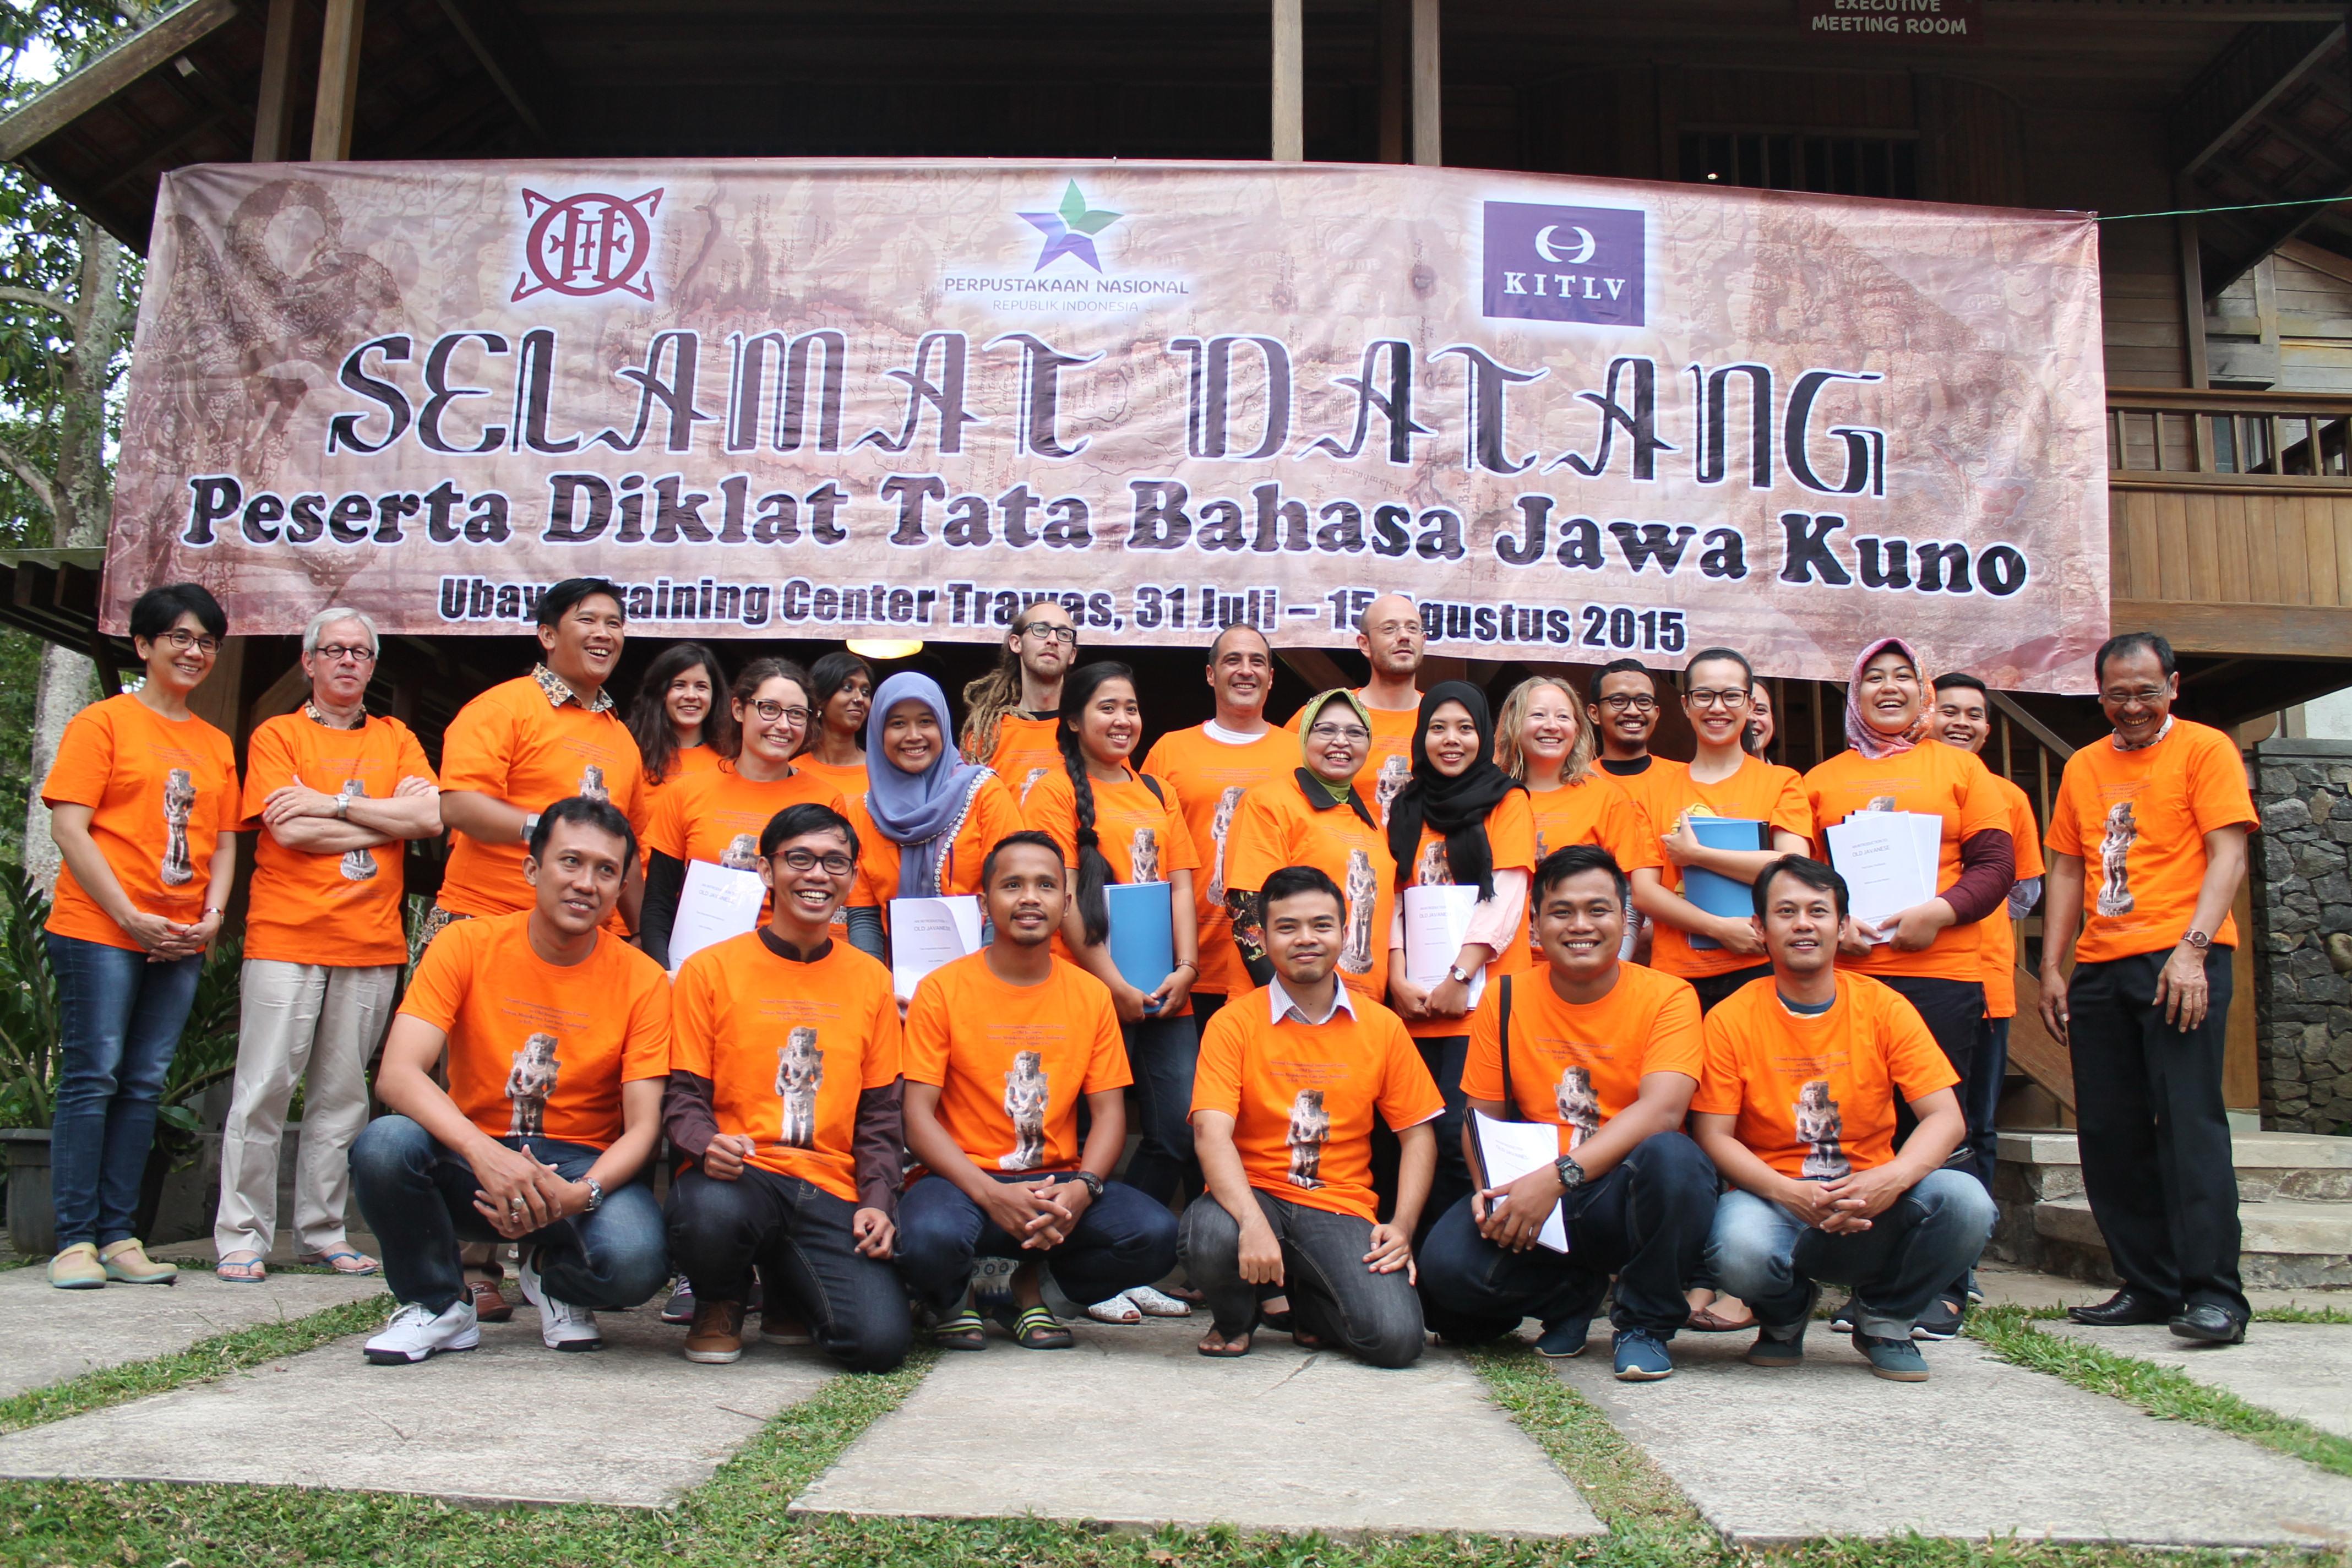 Belajar Lagi Bahasa Jawa Kuno<br /> di Kaki Gunung Penanggungan&#8221; title=&#8221;Belajar Lagi Bahasa Jawa Kuno<br /> di Kaki Gunung Penanggungan&#8221; width=&#8221;150&#8243; height=&#8221;150&#8243; class=&#8221;crp_thumb crp_correctfirst&#8221; /><span class=